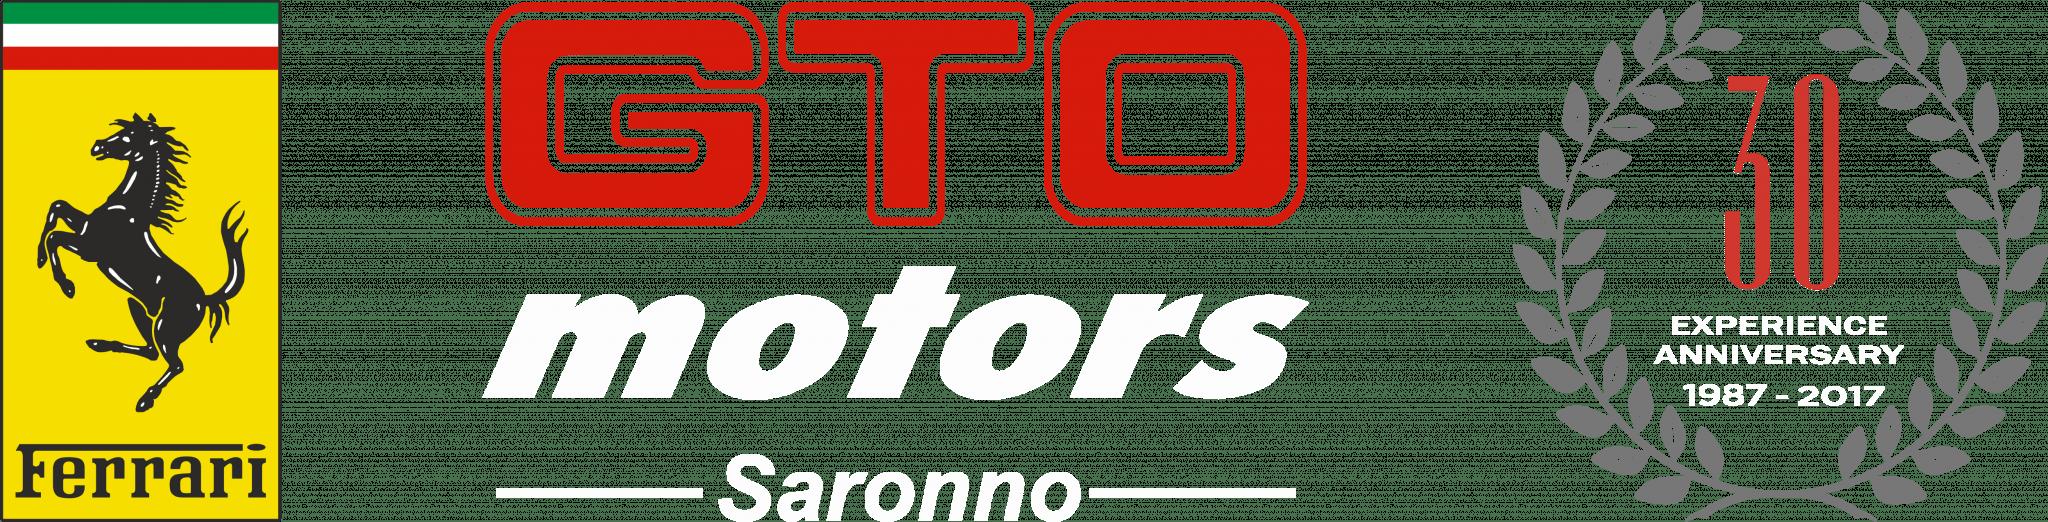 GTO motors